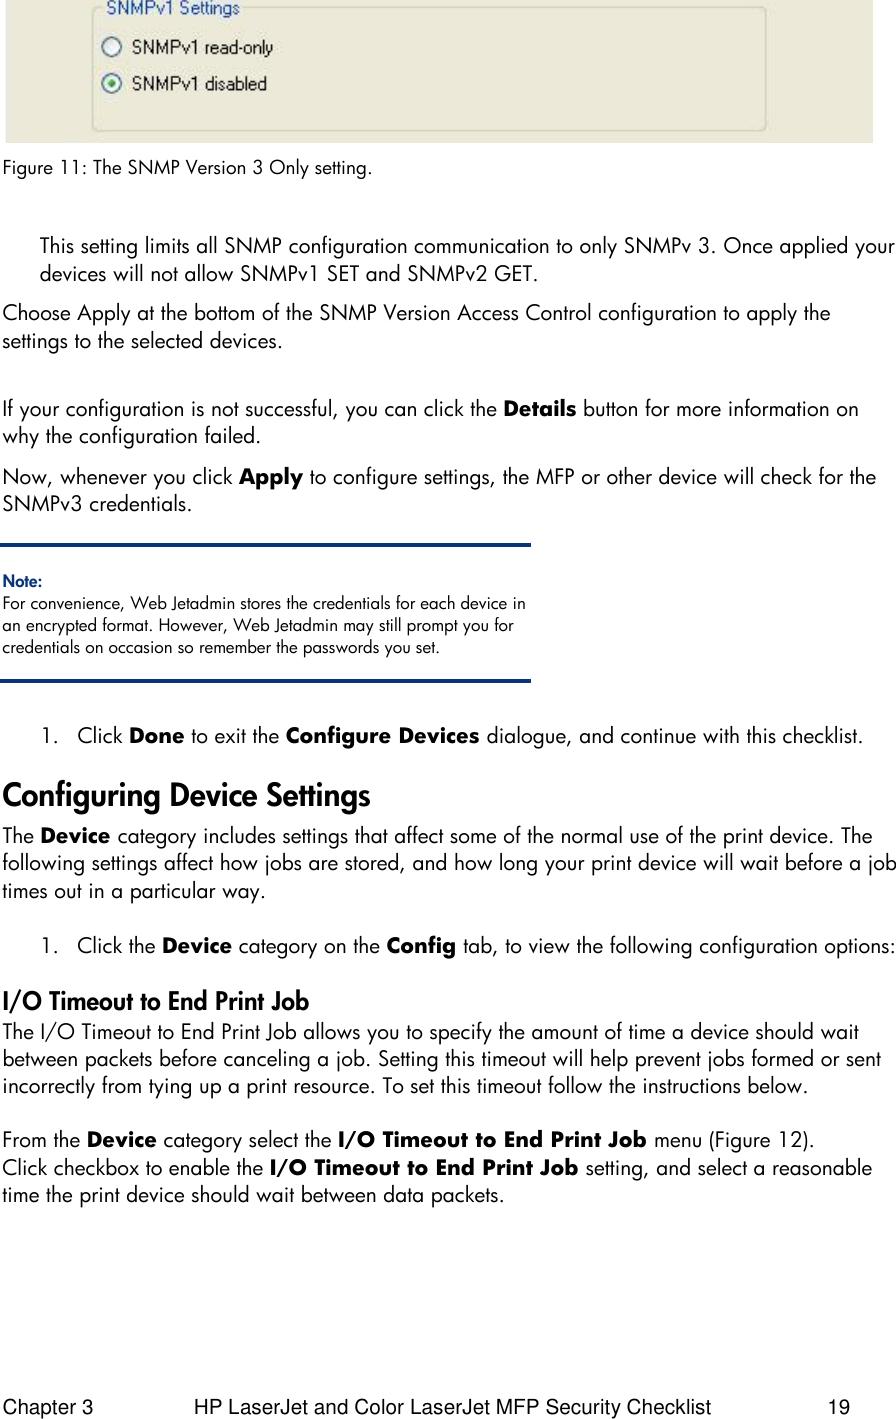 HP LaserJet And Color MFP Security Checklist Enterprise Printers